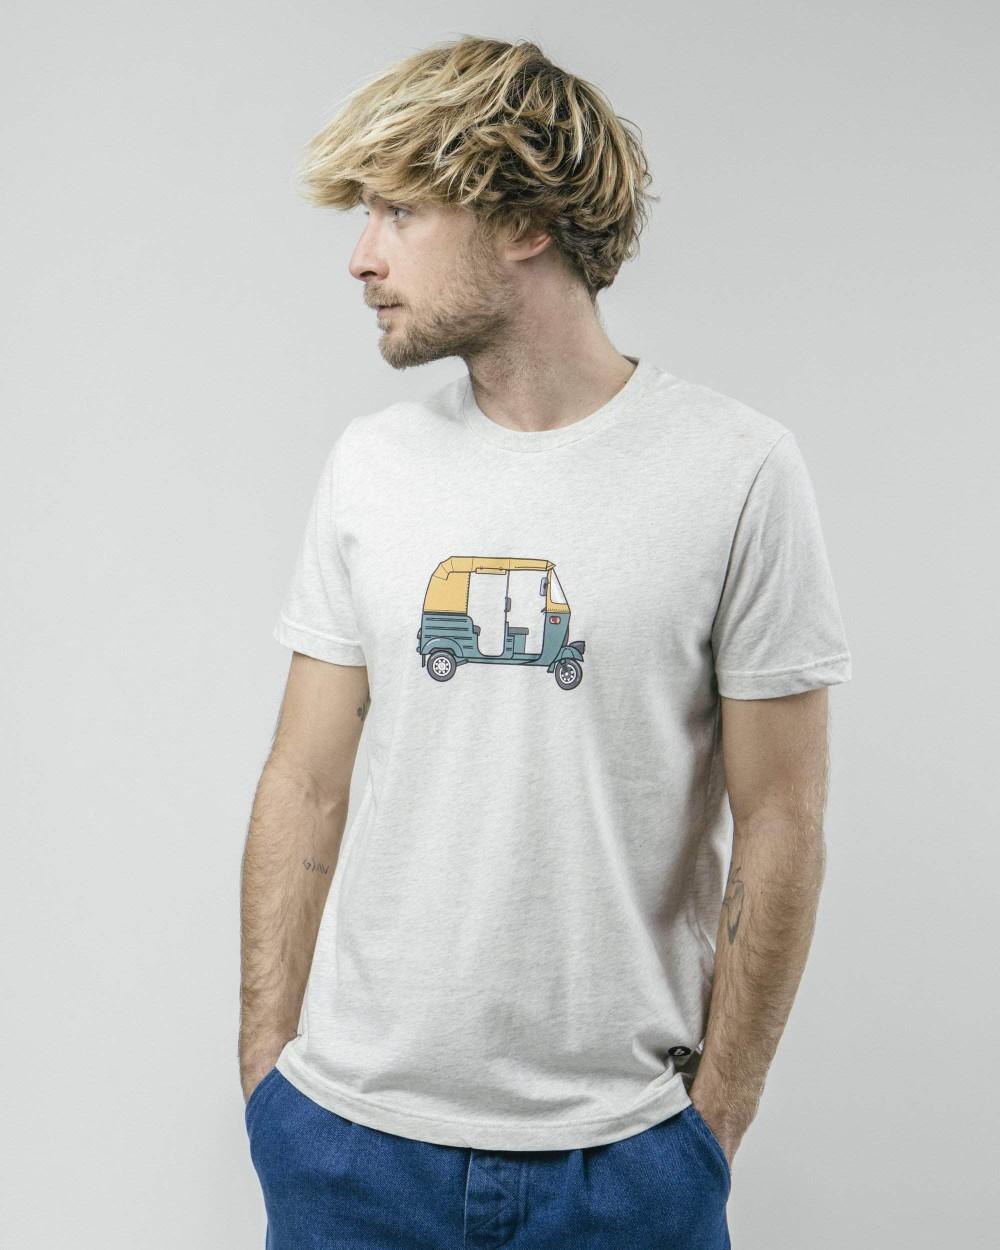 Tuk tuk race t-shirt - Brava Fabrics